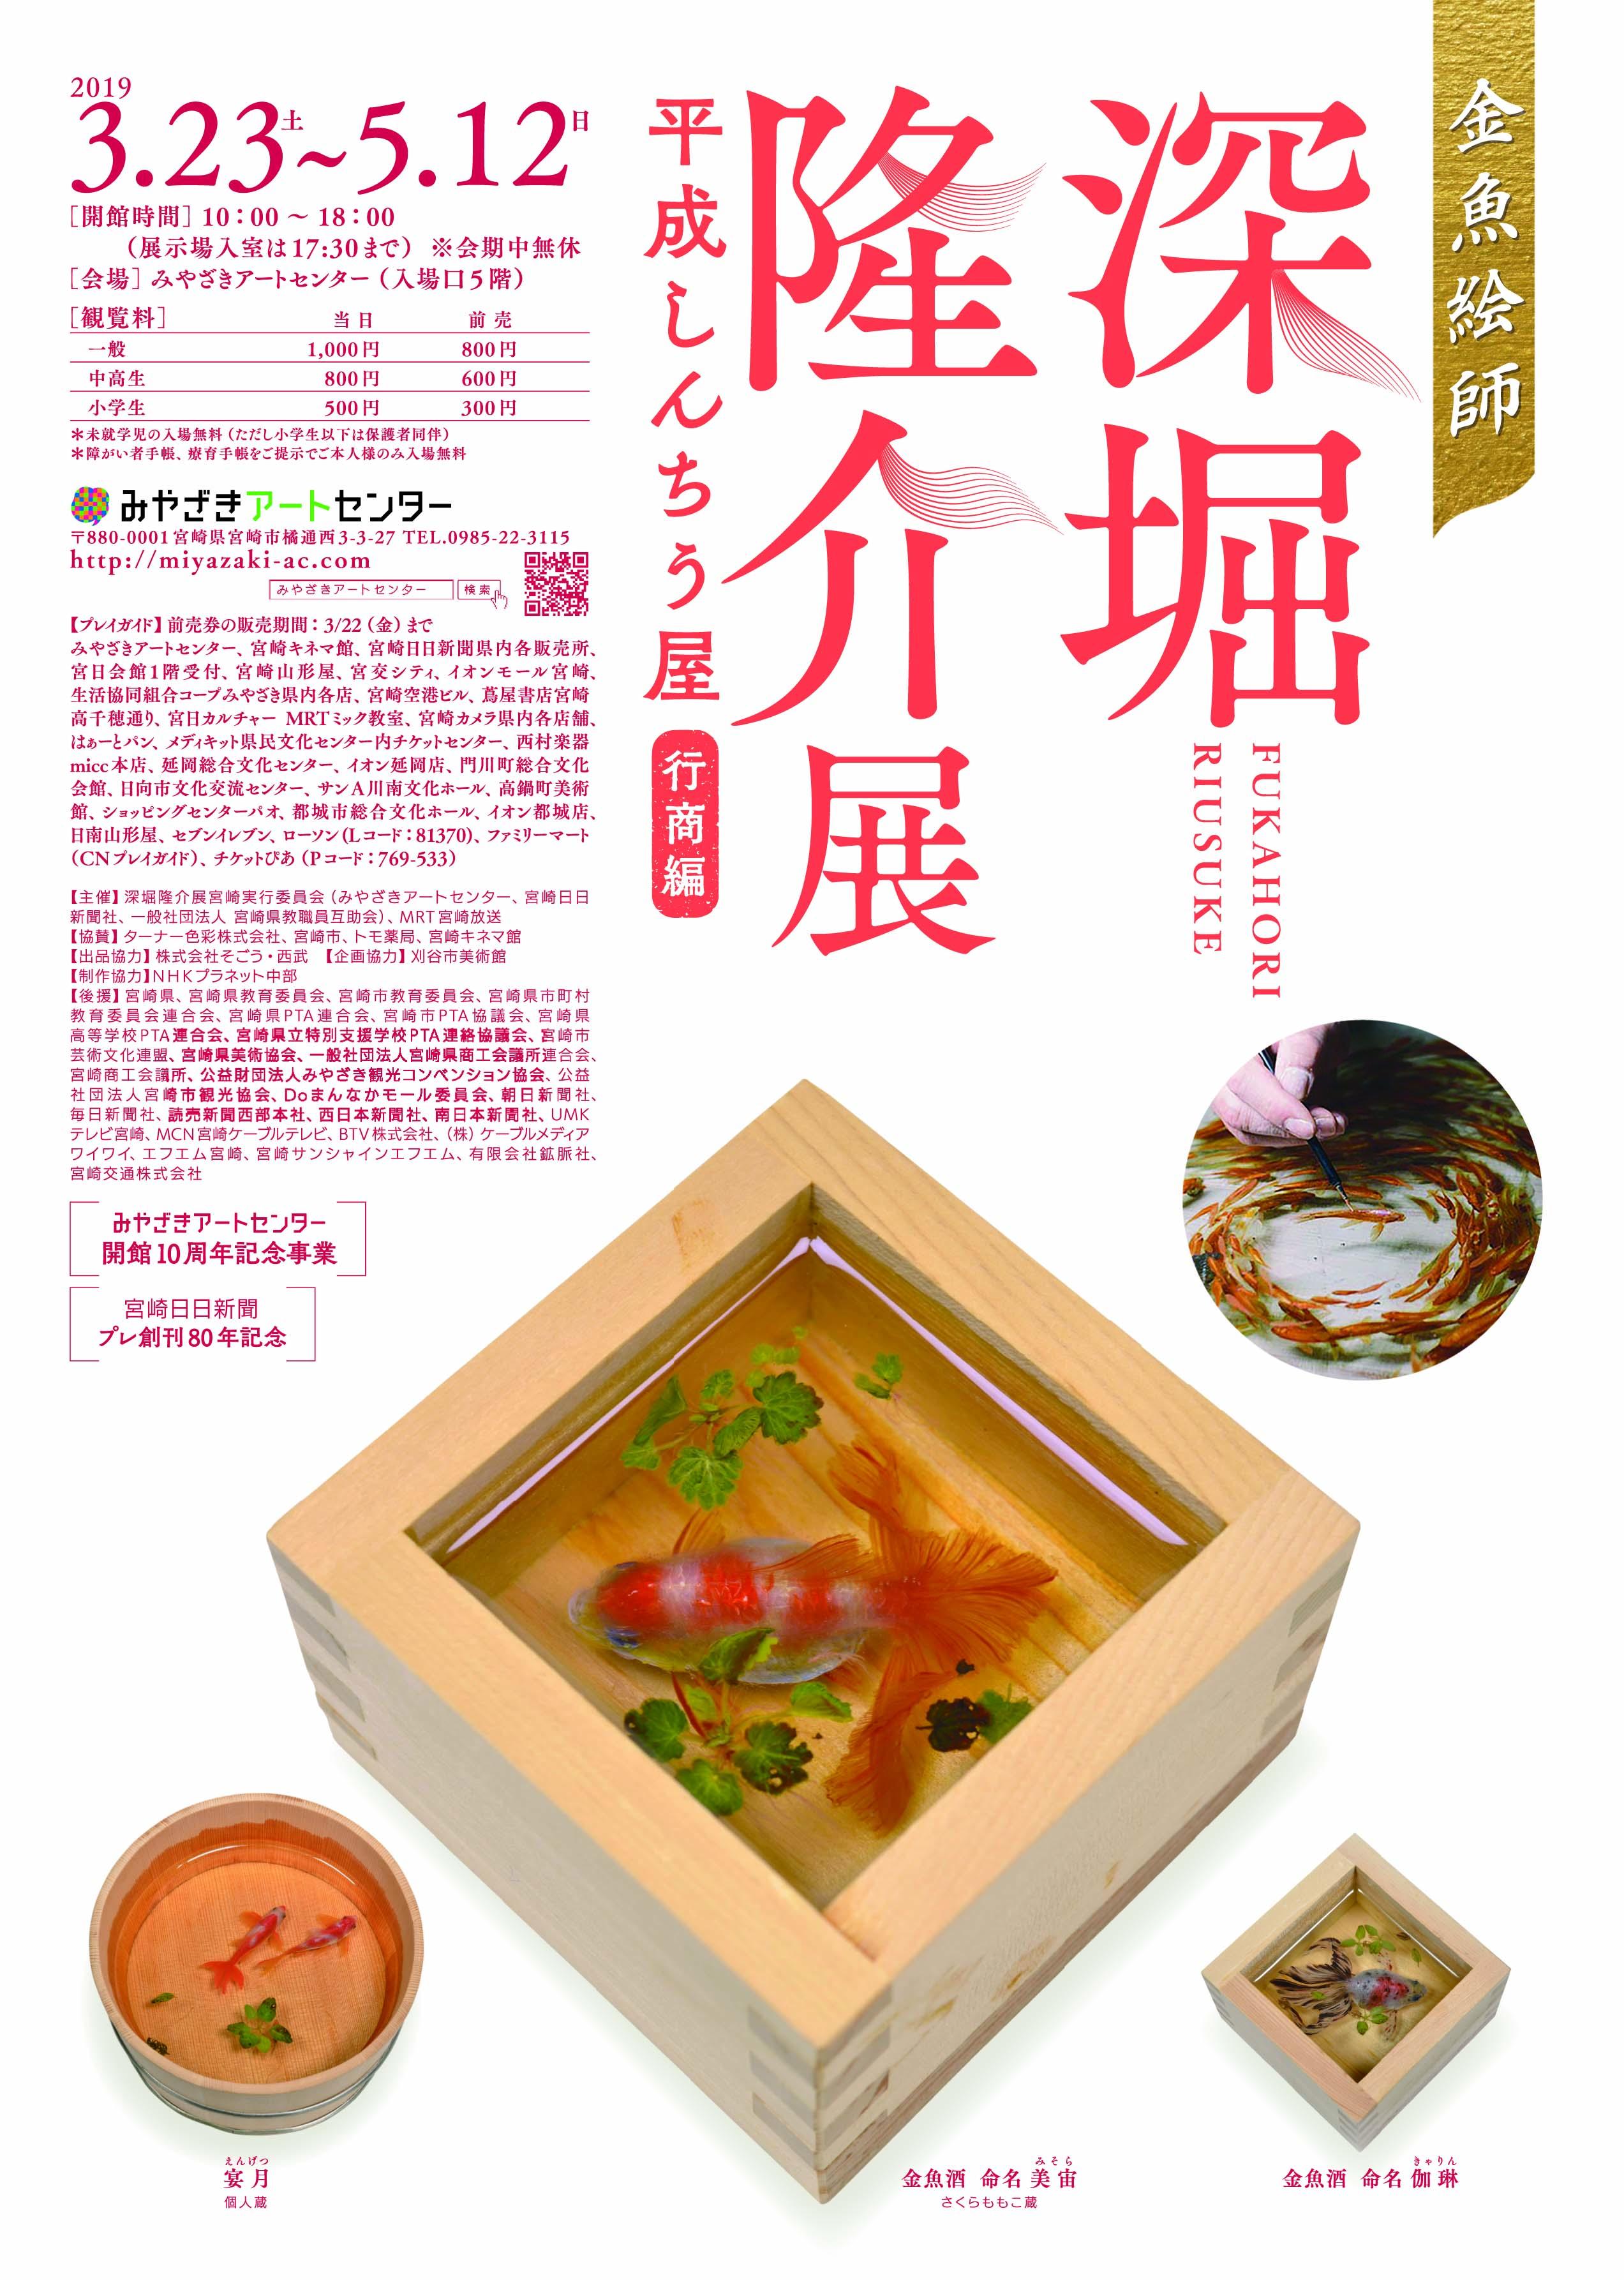 https://www.miyazaki-kyogo.or.jp/publiculture/art/kingyo/omote_hukahori.jpg